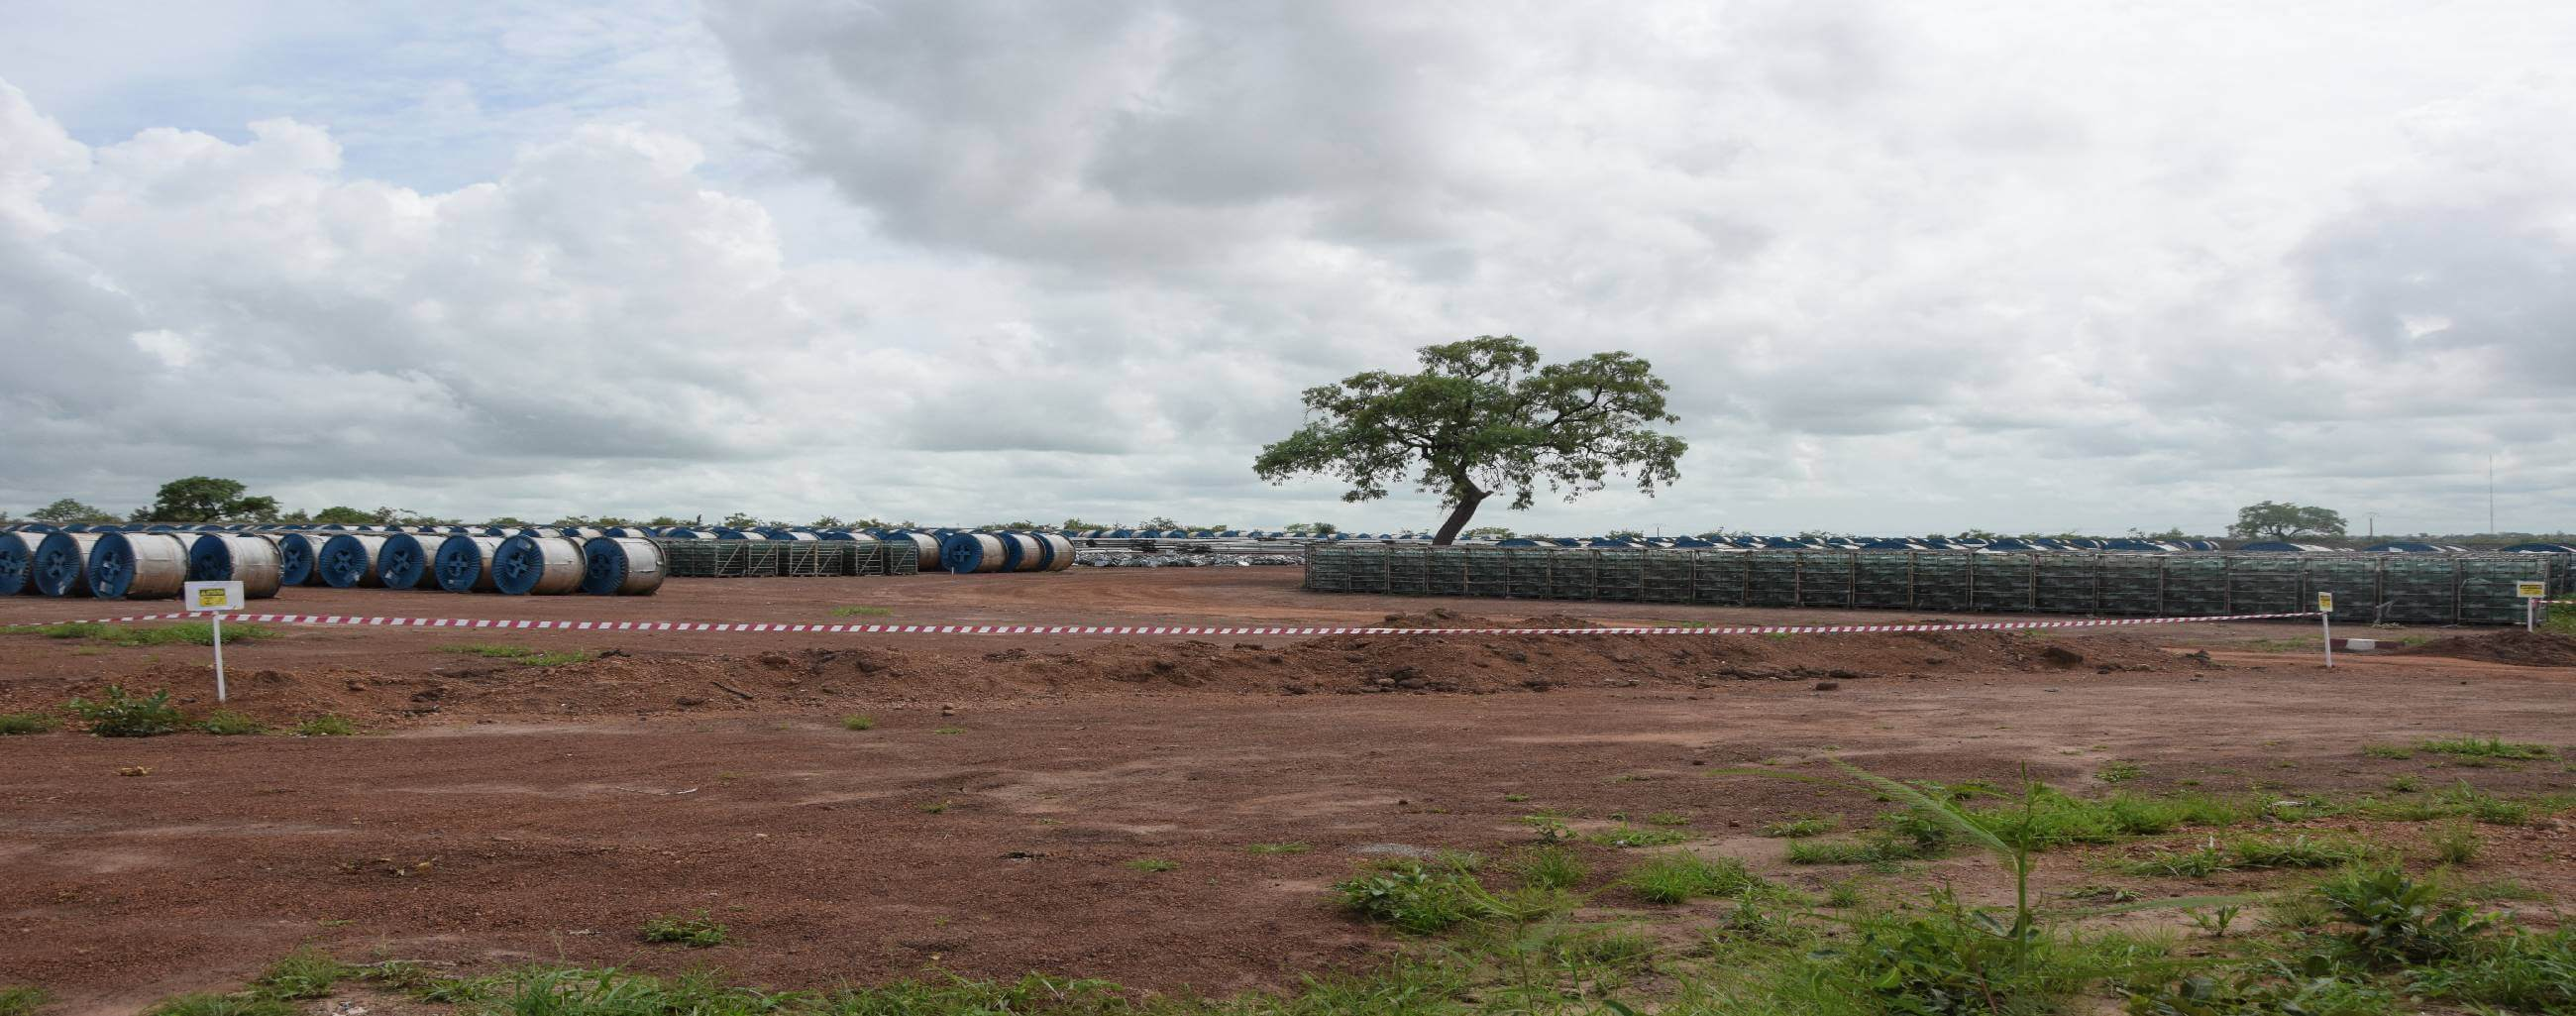 Site de stockage Projet Energie OMVG